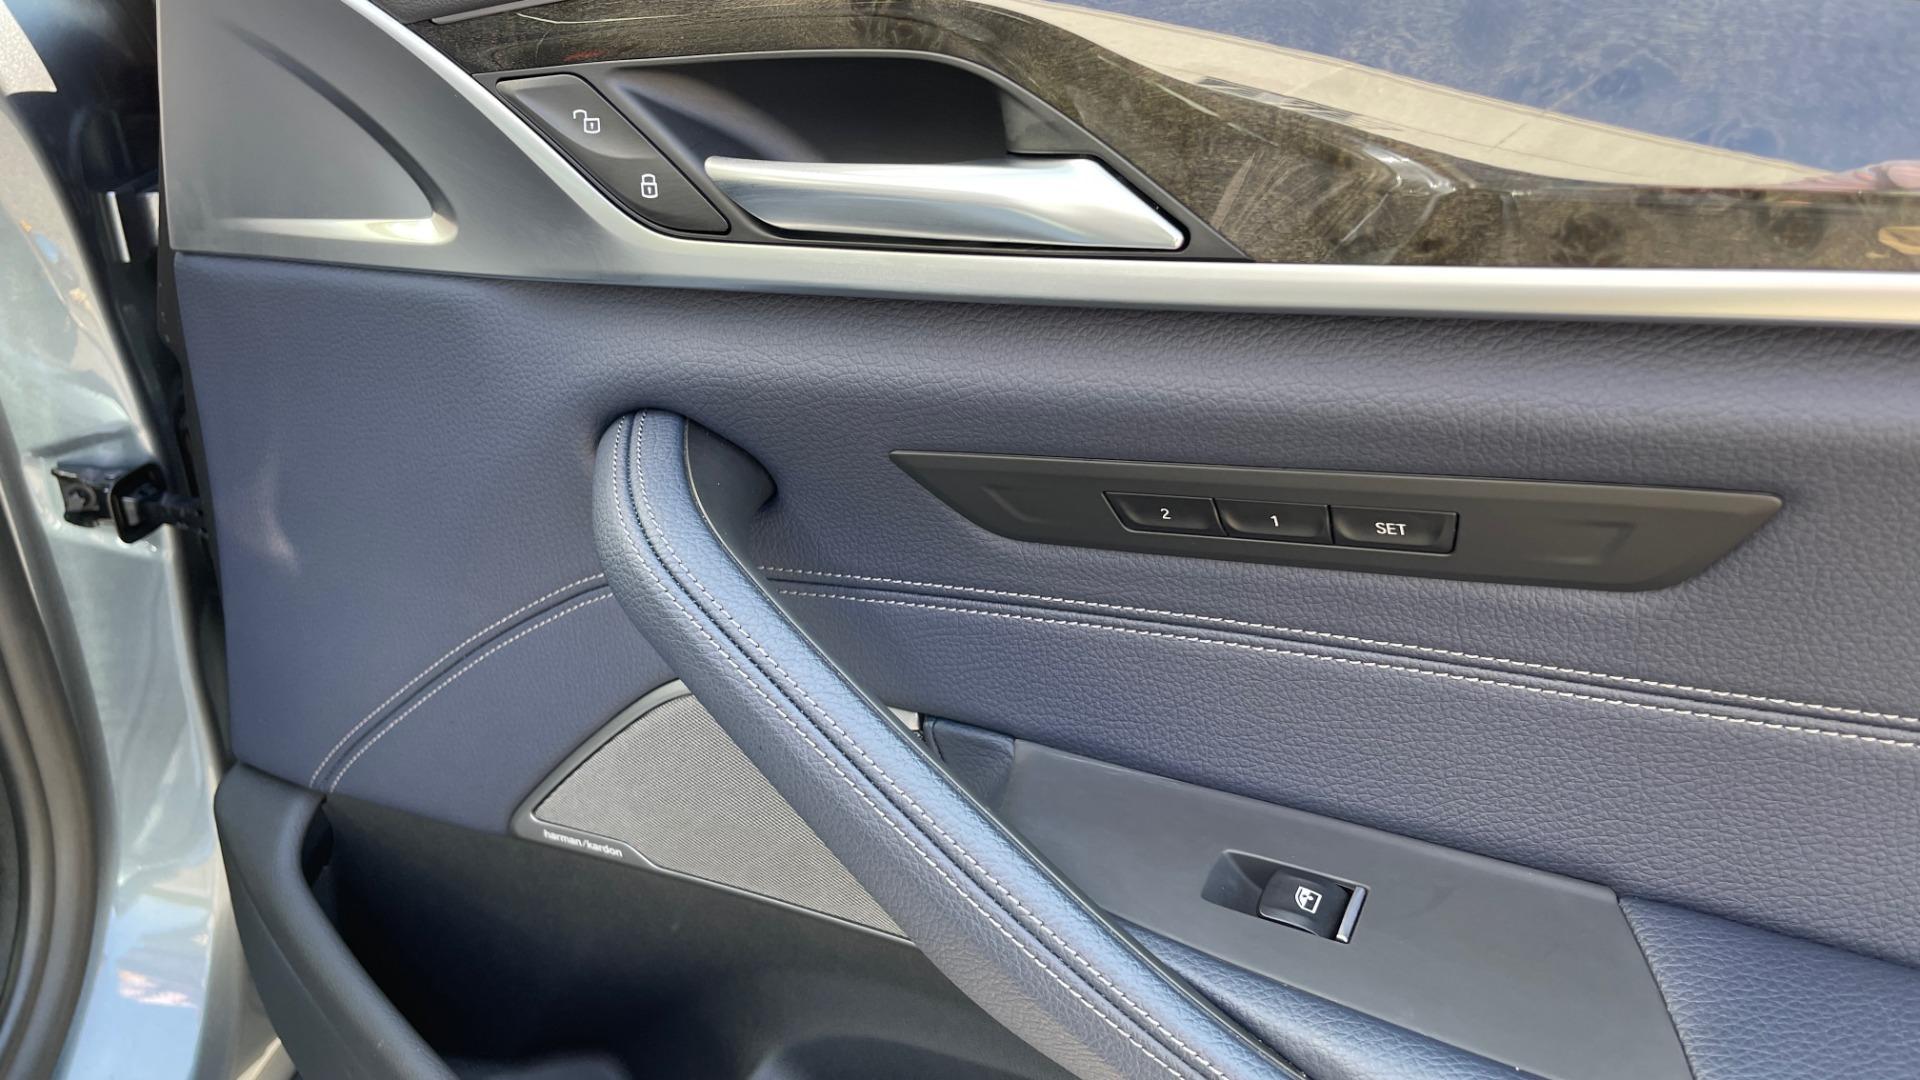 Used 2018 BMW 5 SERIES 540I XDRIVE M-SPORT / DRVR ASST / PDC / APPLE / HUD / H/K SND for sale $42,795 at Formula Imports in Charlotte NC 28227 65